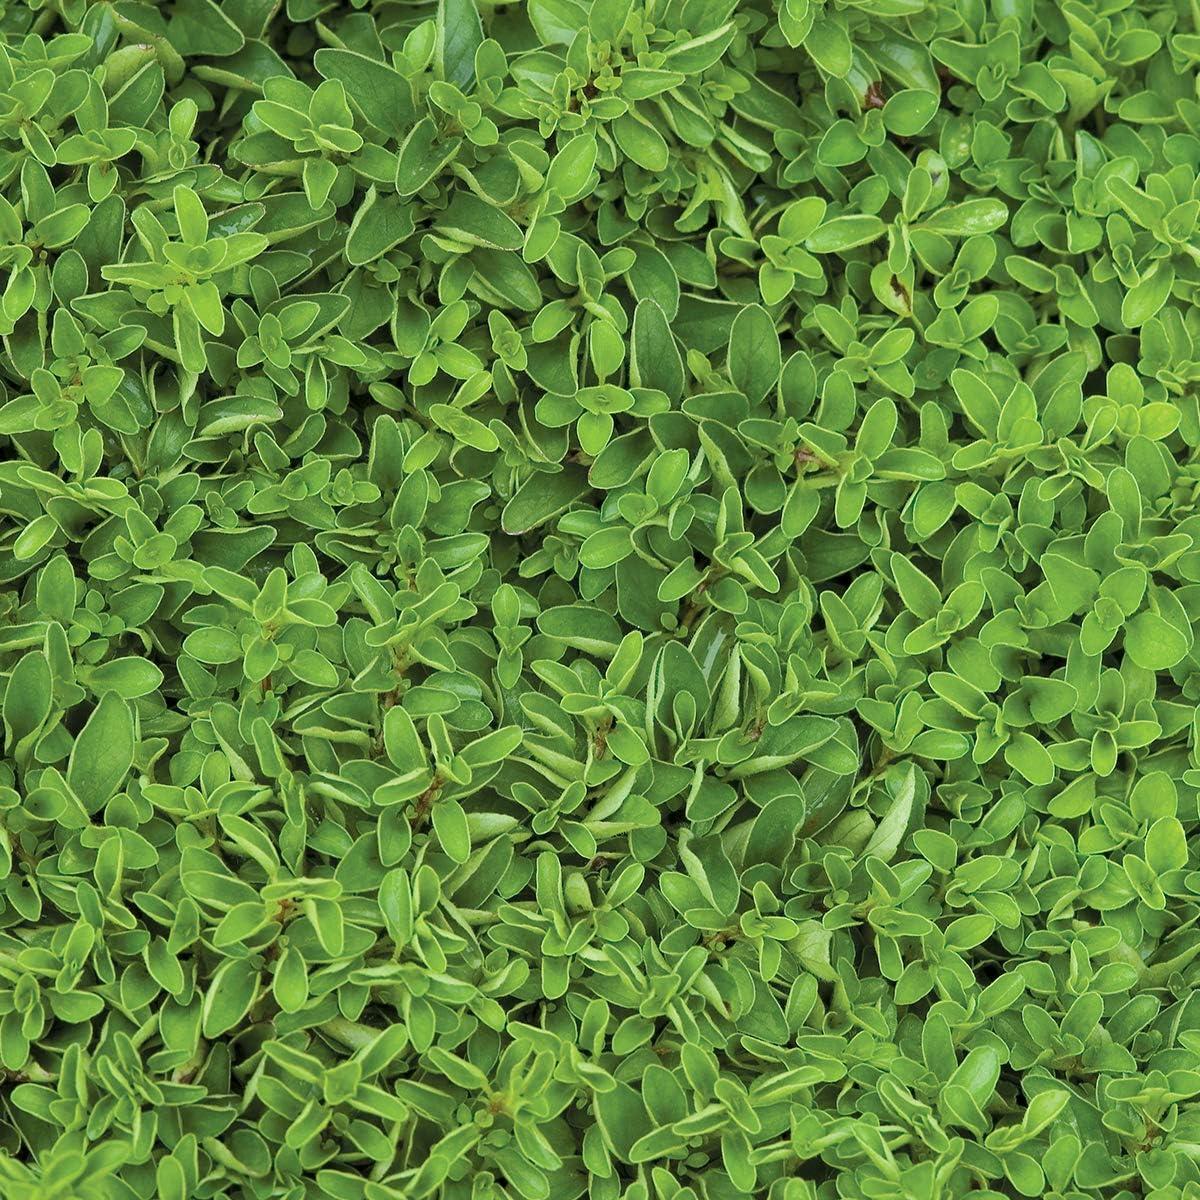 Burpee Sweet Marjoram Seeds 2000 seeds